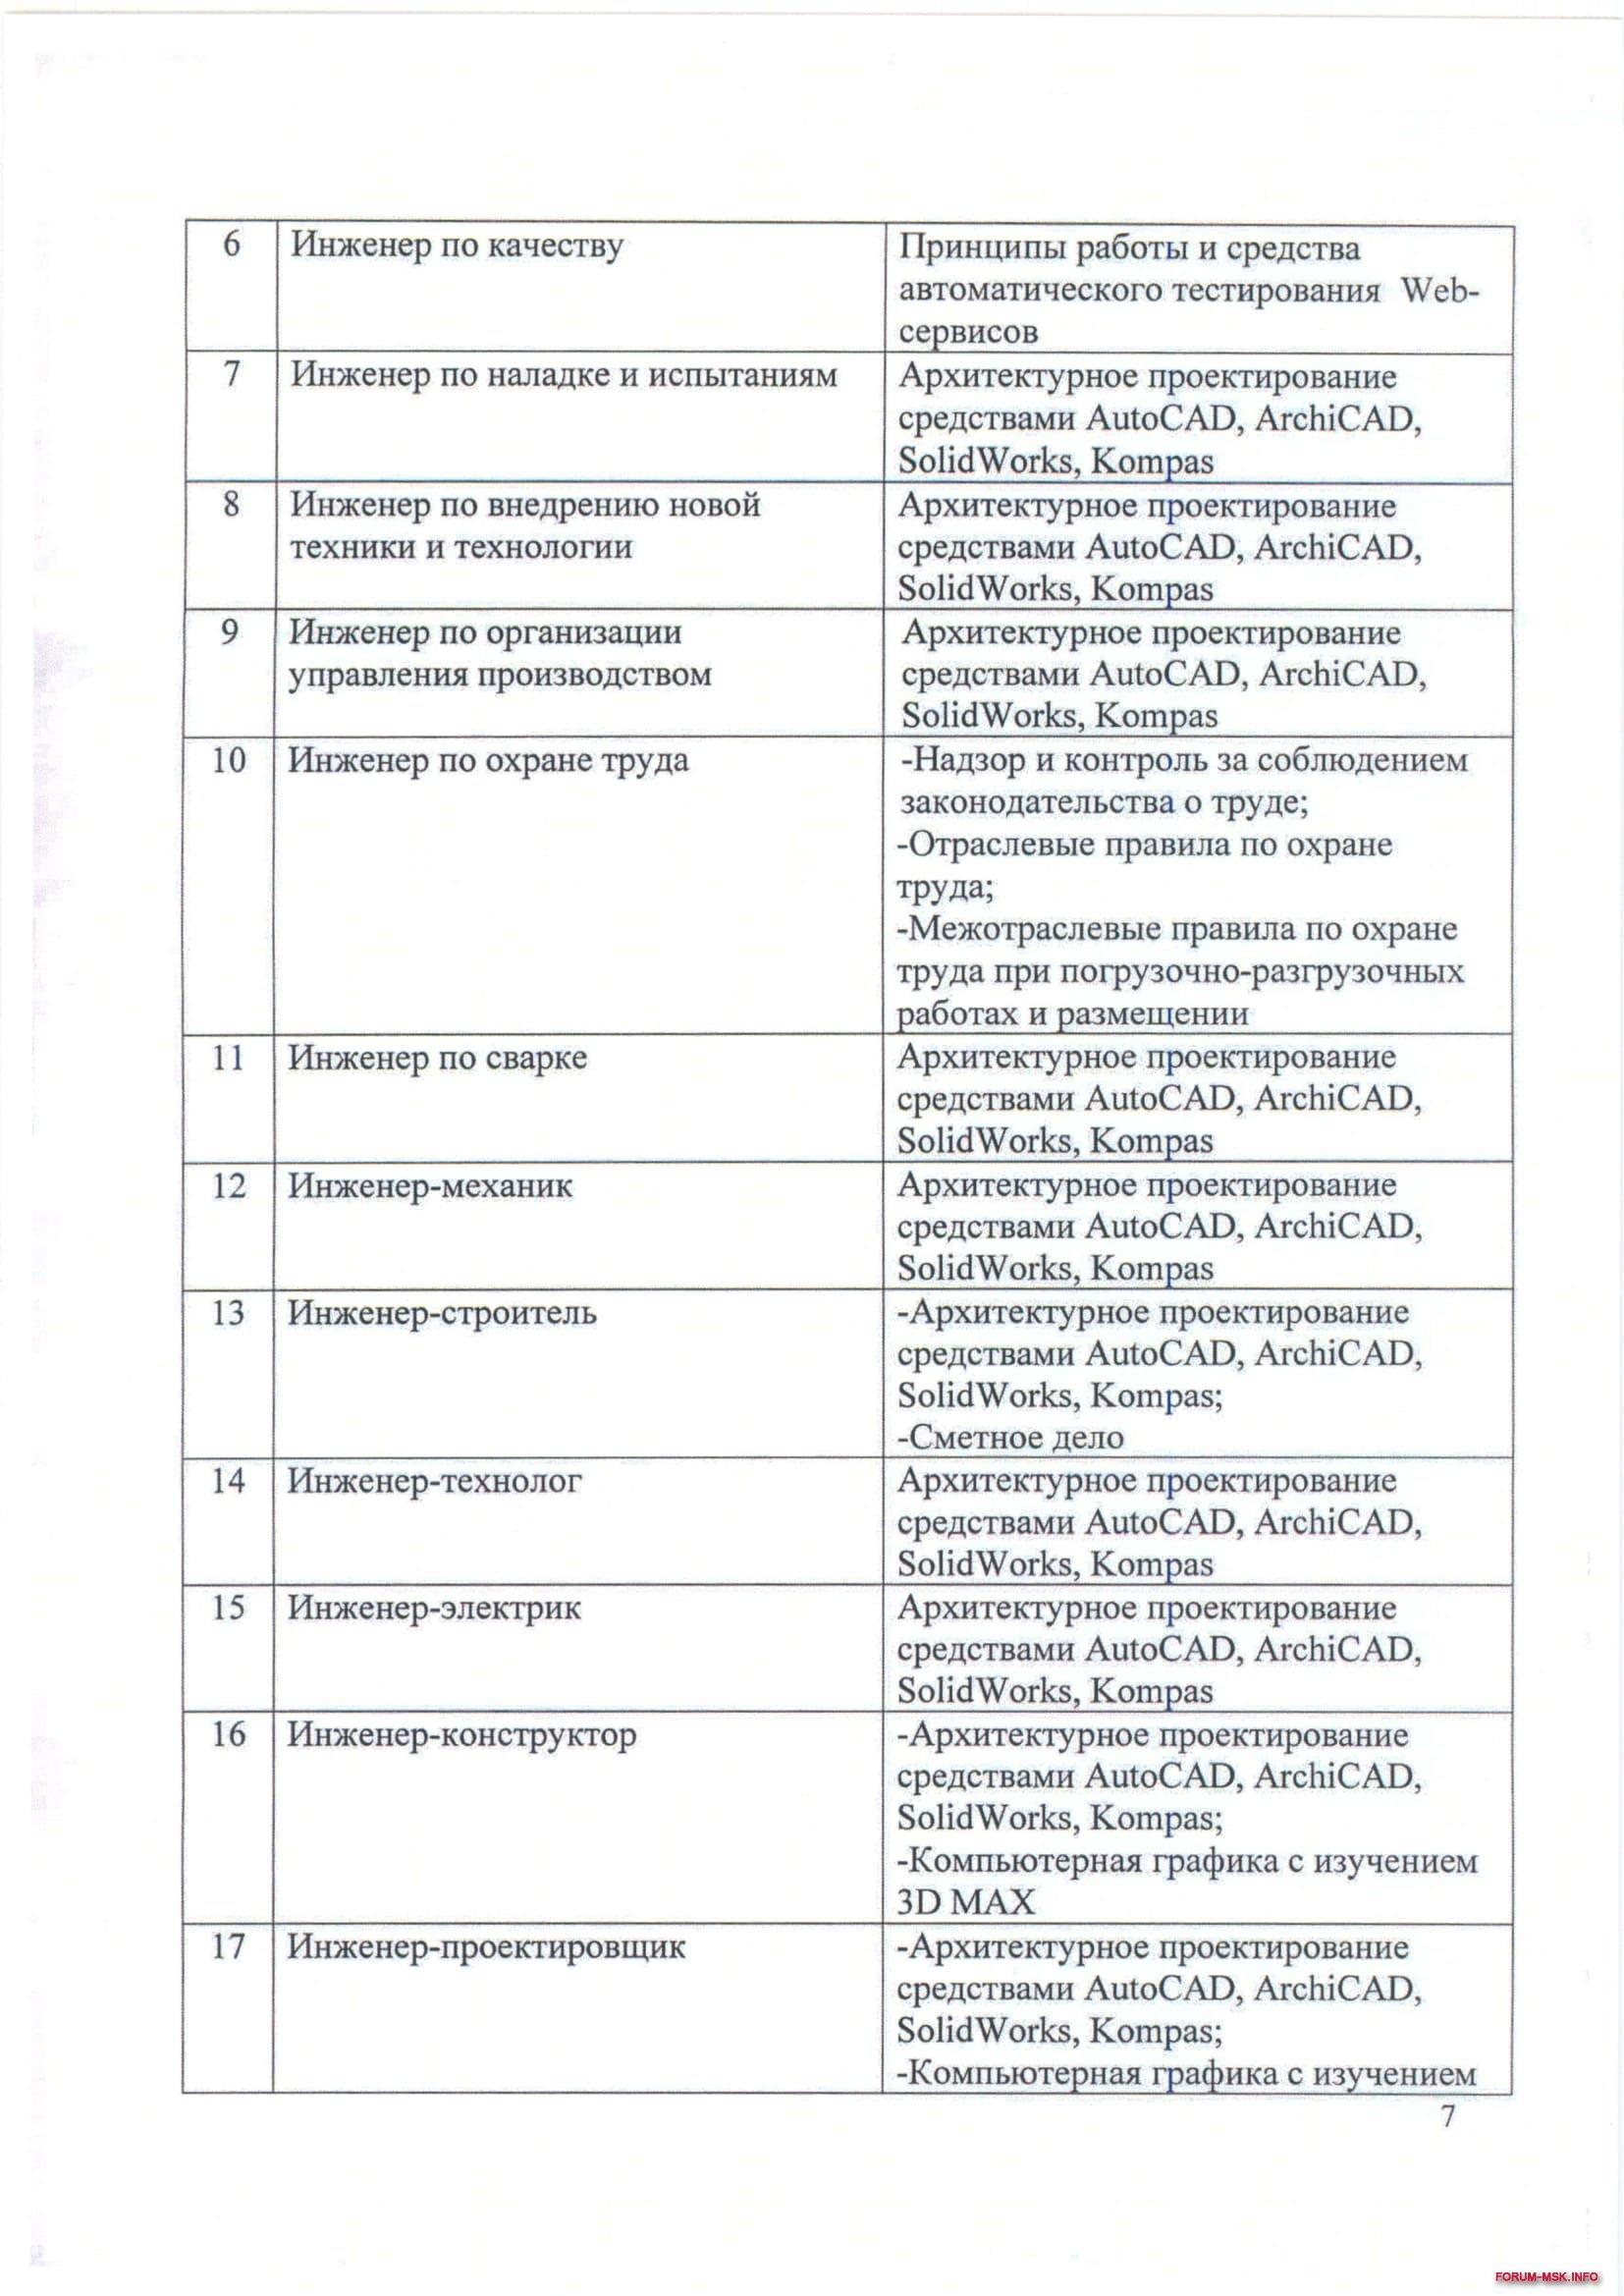 приказ дтсзн города москвы №1334-06.jpg